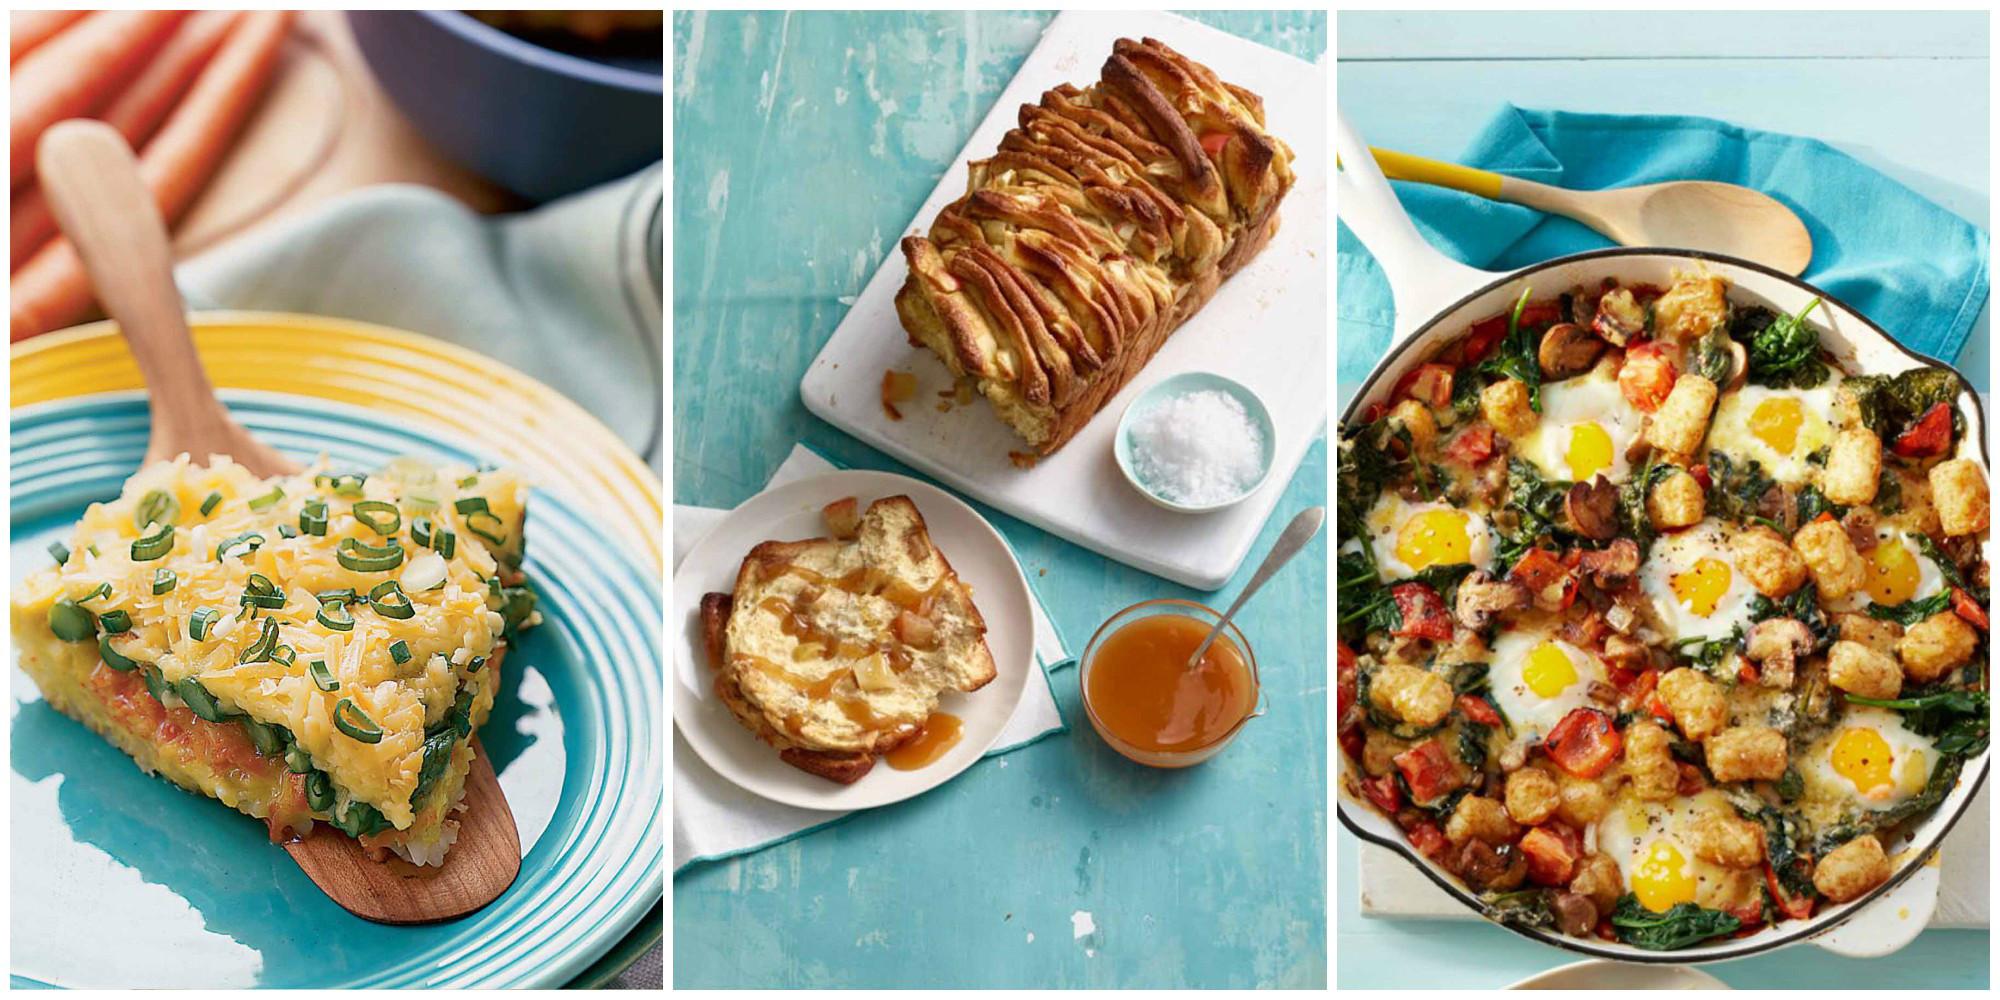 Easter Dinner Menu Ideas And Recipes  21 Best Easter Brunch Recipes Easy Easter Sunday Brunch